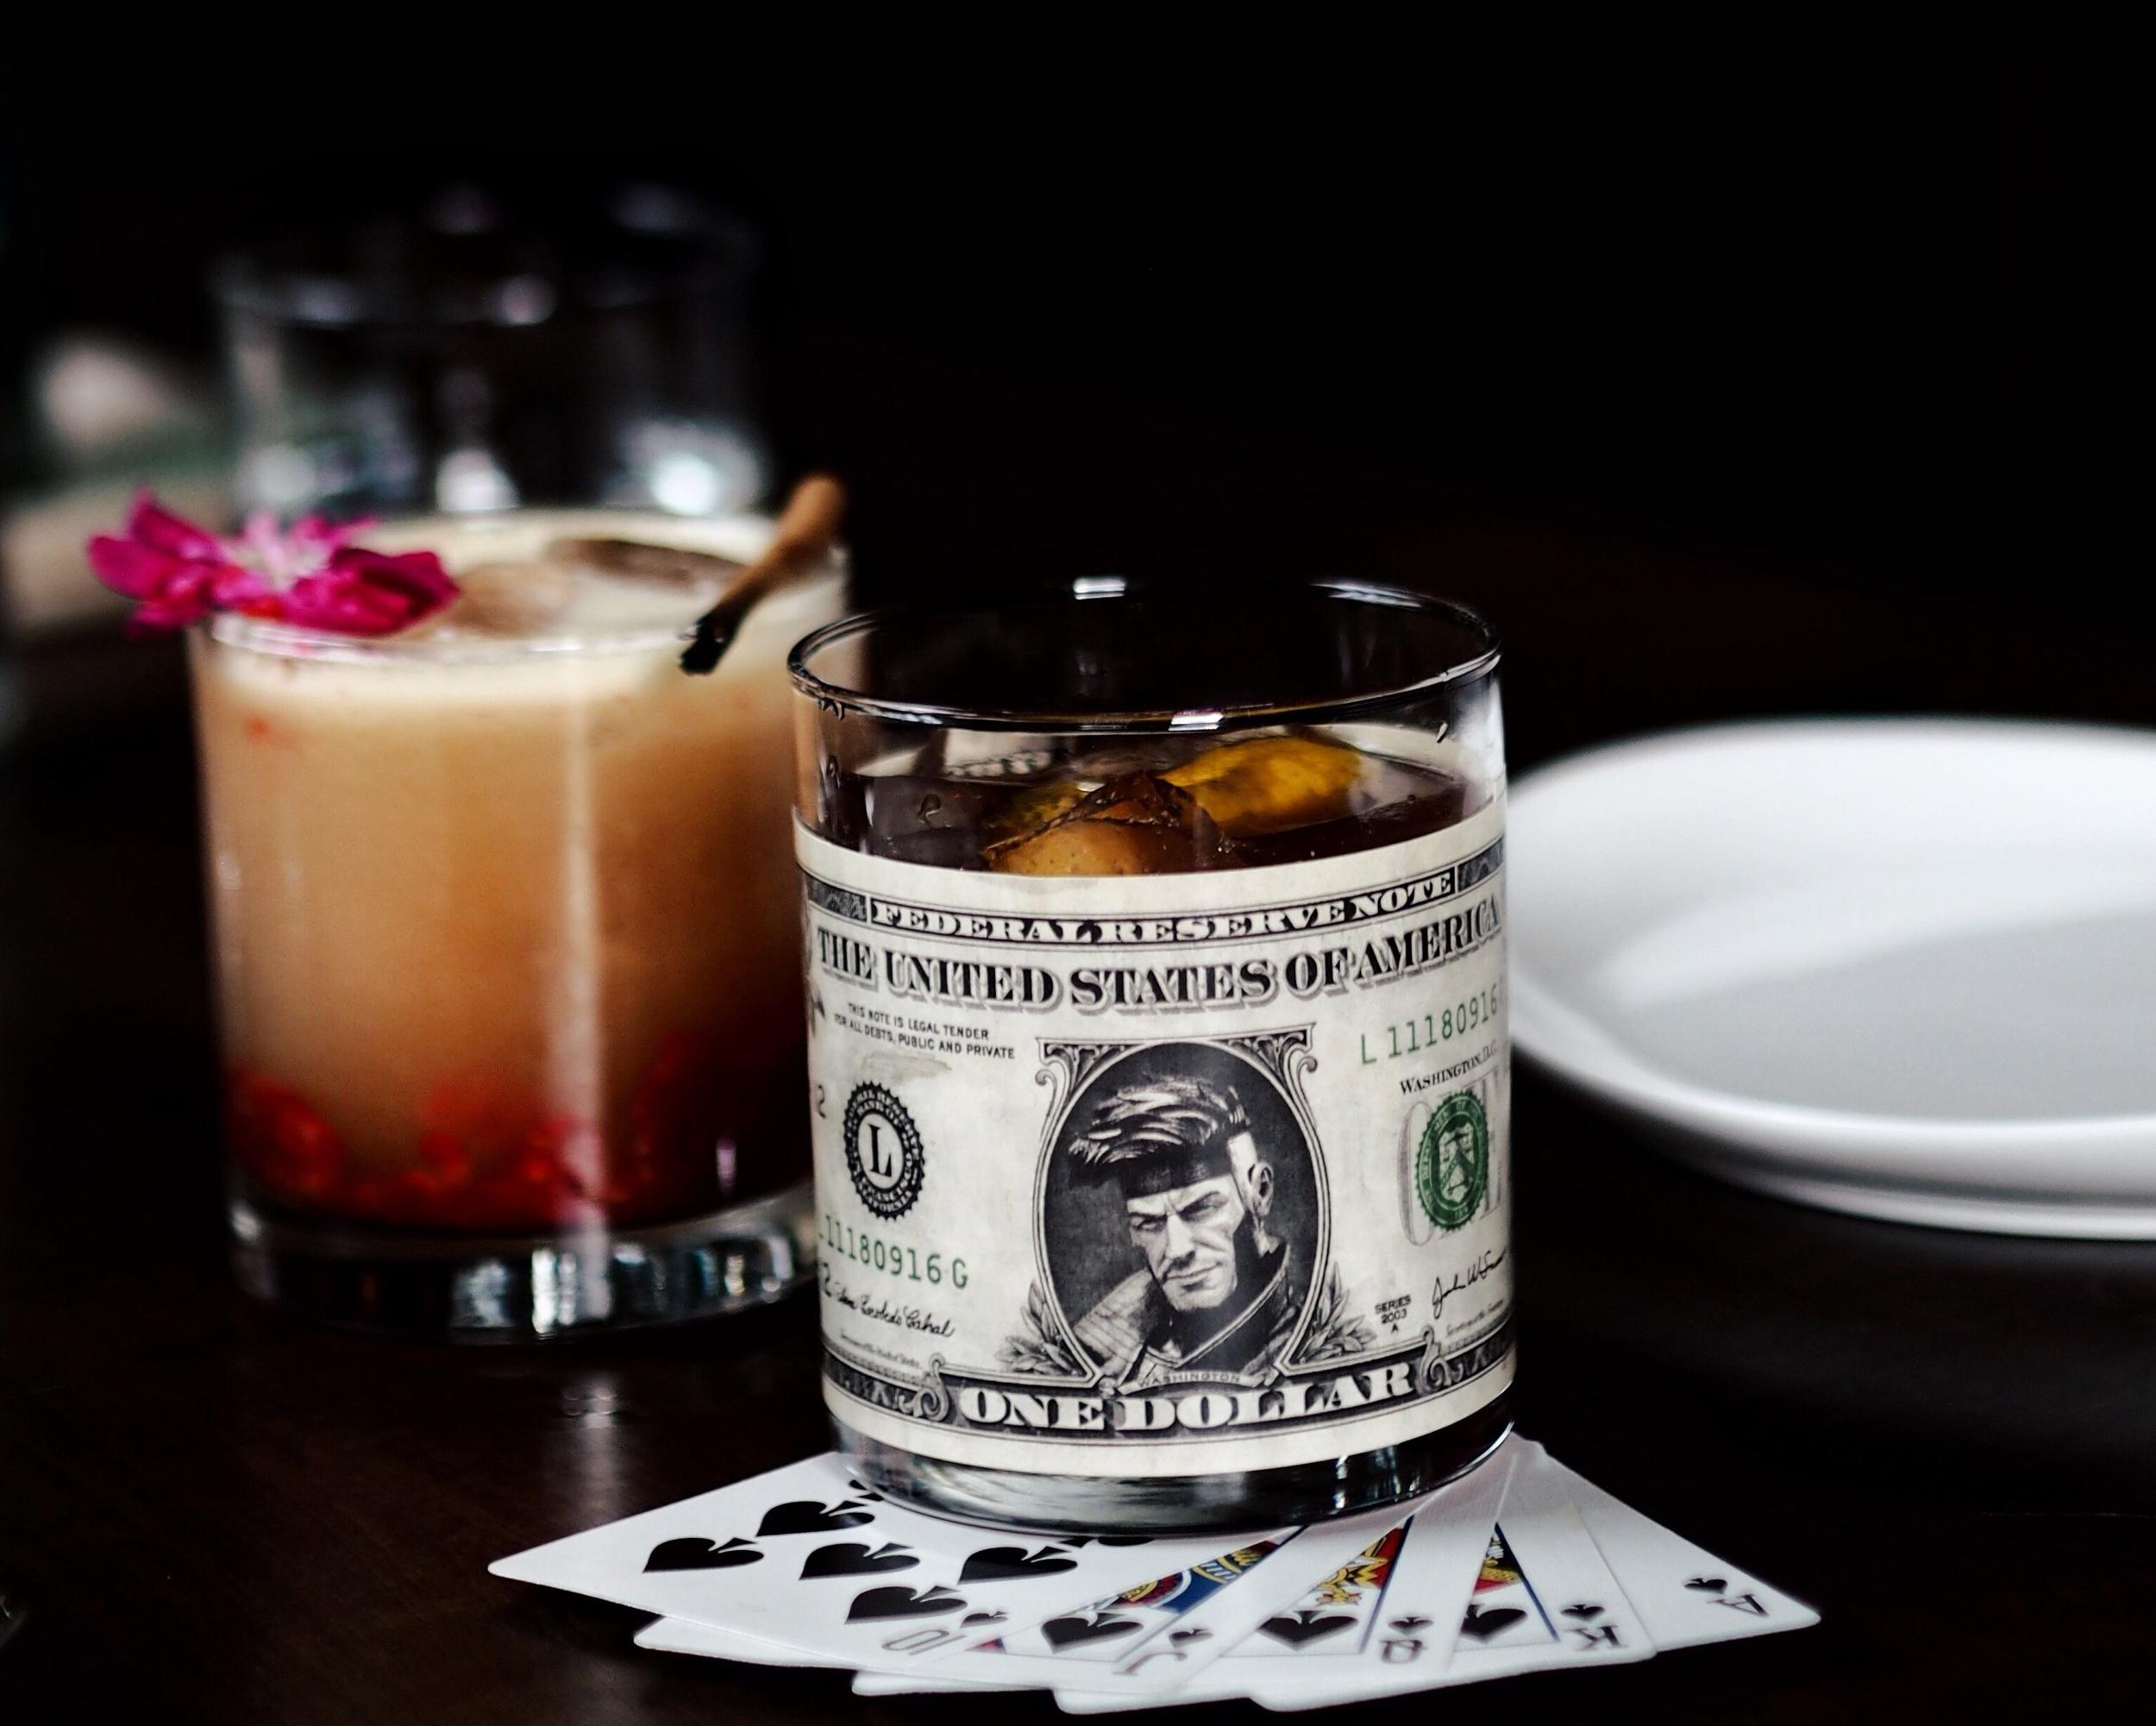 Le Diable Blanc : J.P. Wiser's Double Still Rye, Remy Martin VSOP, Dubbonet, Bénédictine, Byrrh, Fino Sherry, Creole Bitters ($19.00 + tax)